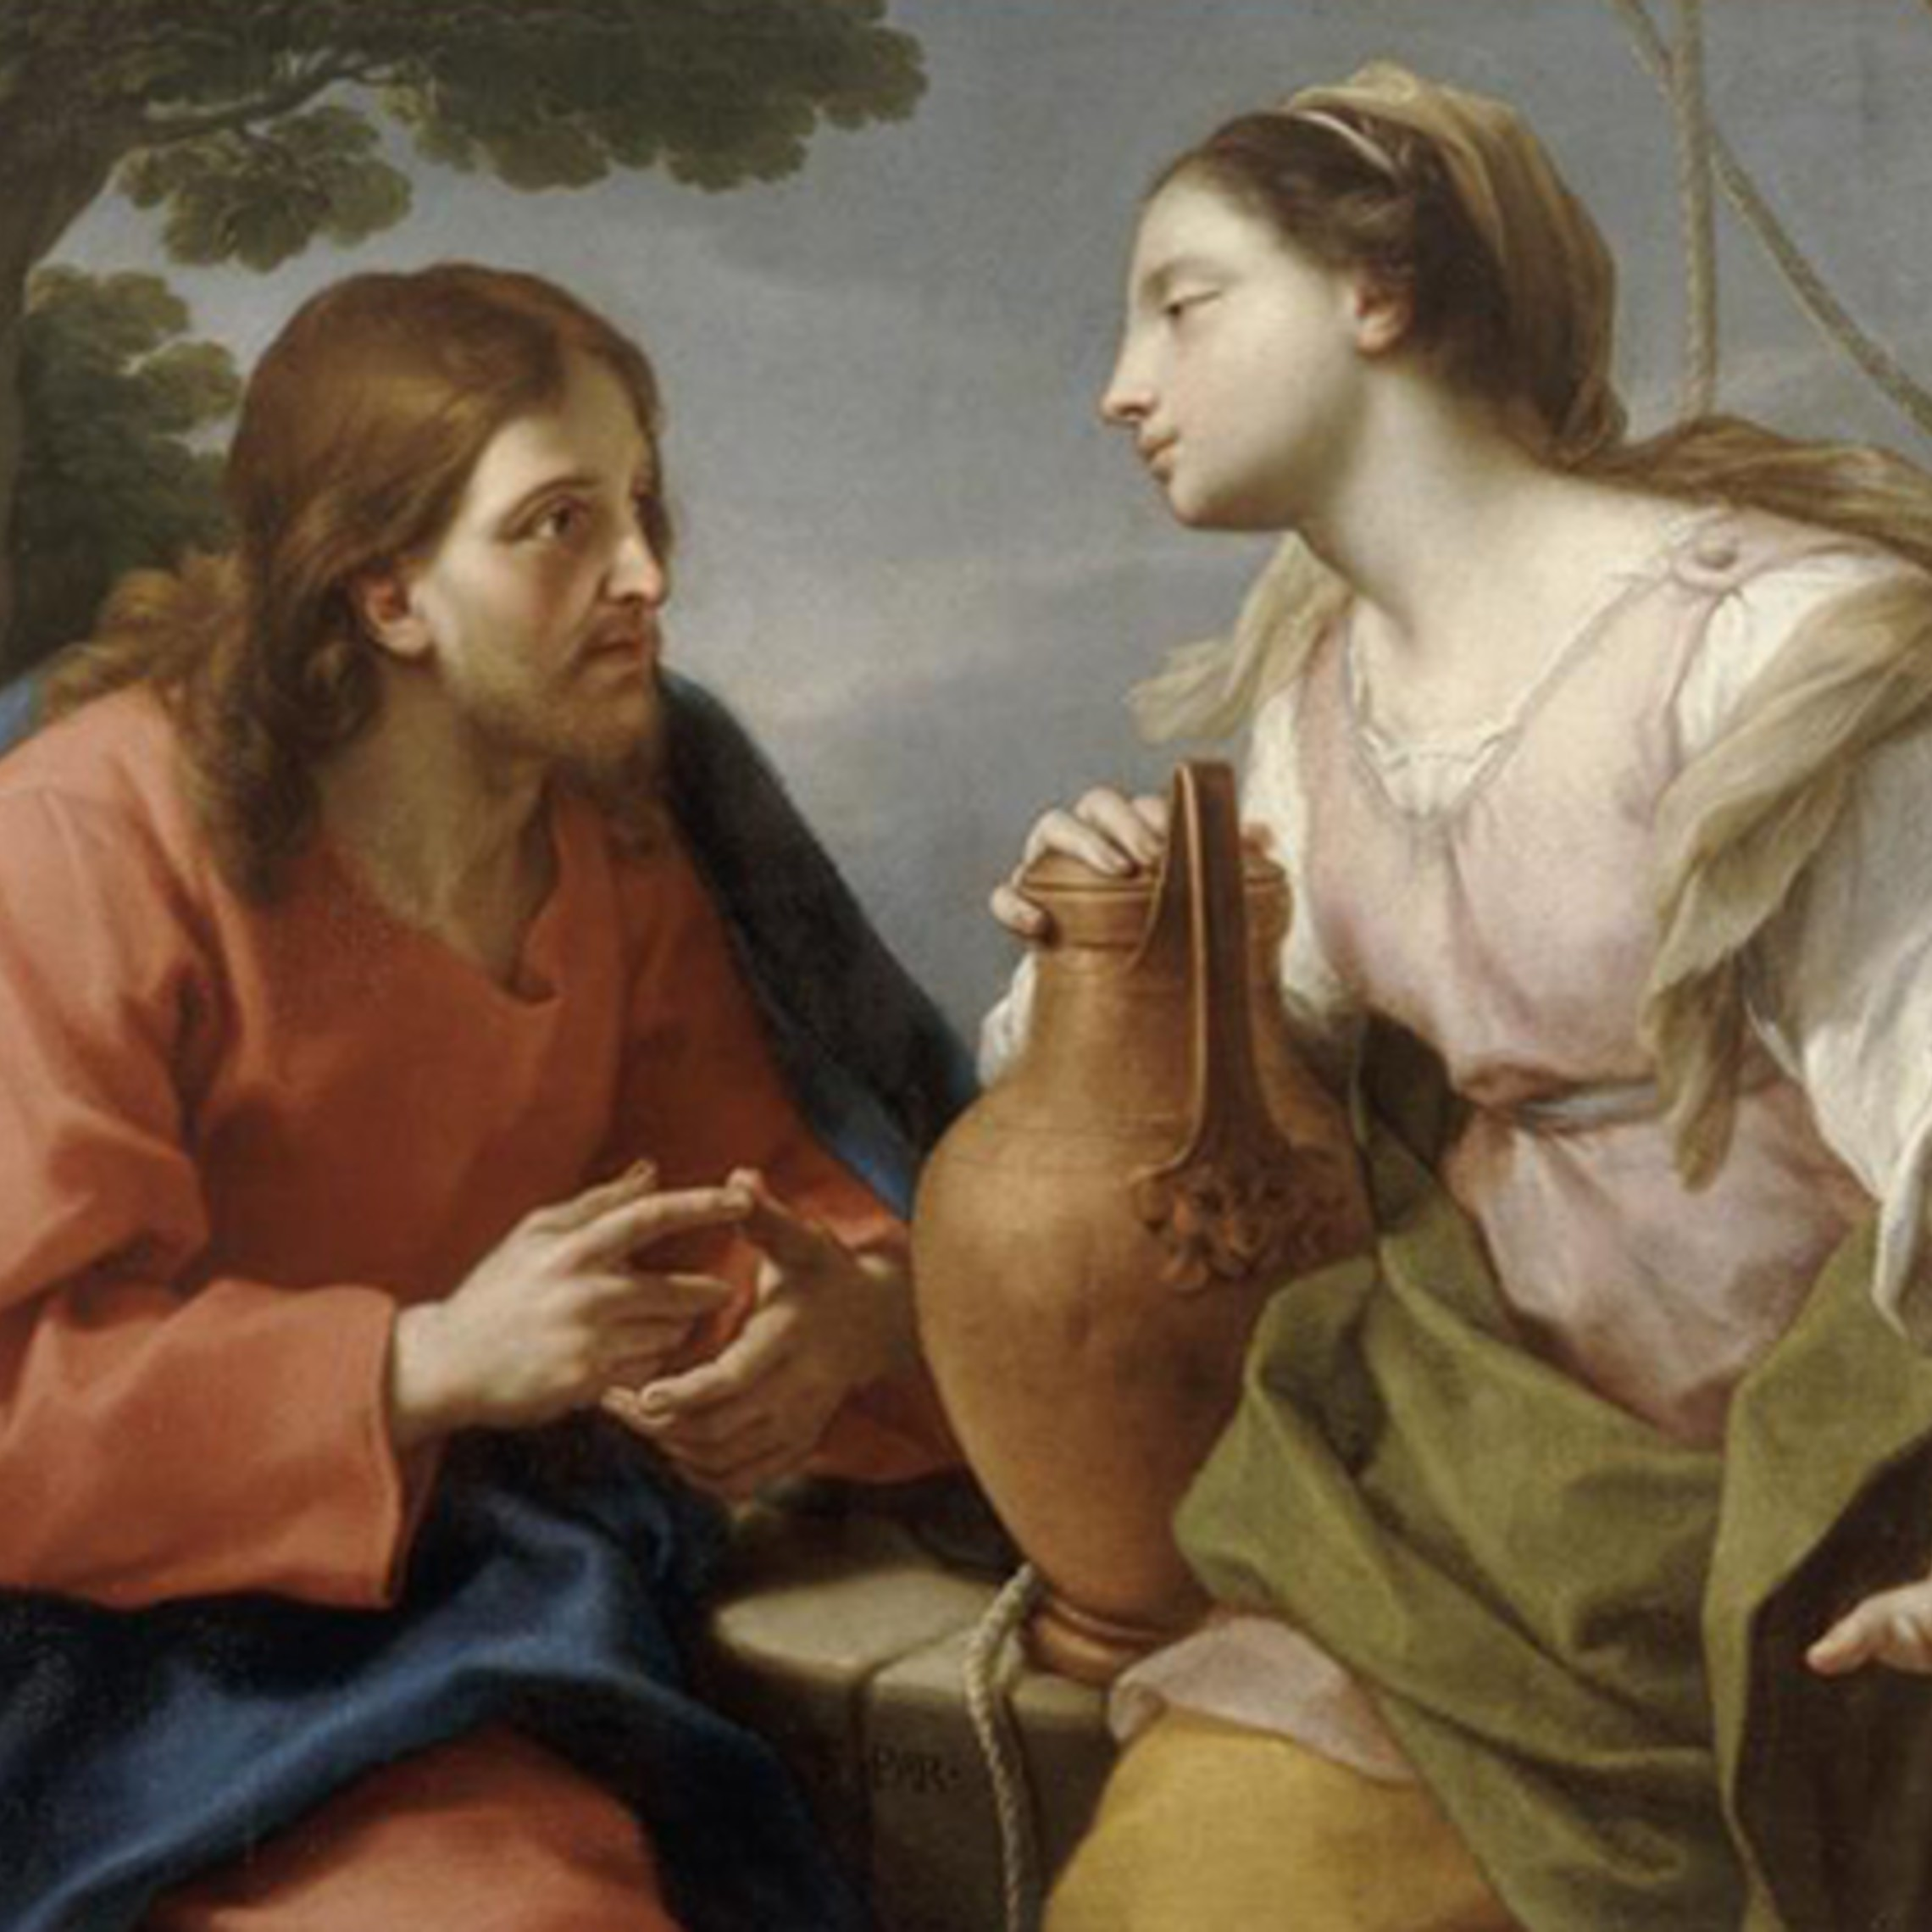 Parrocel-etienne-jesus-samaritaine